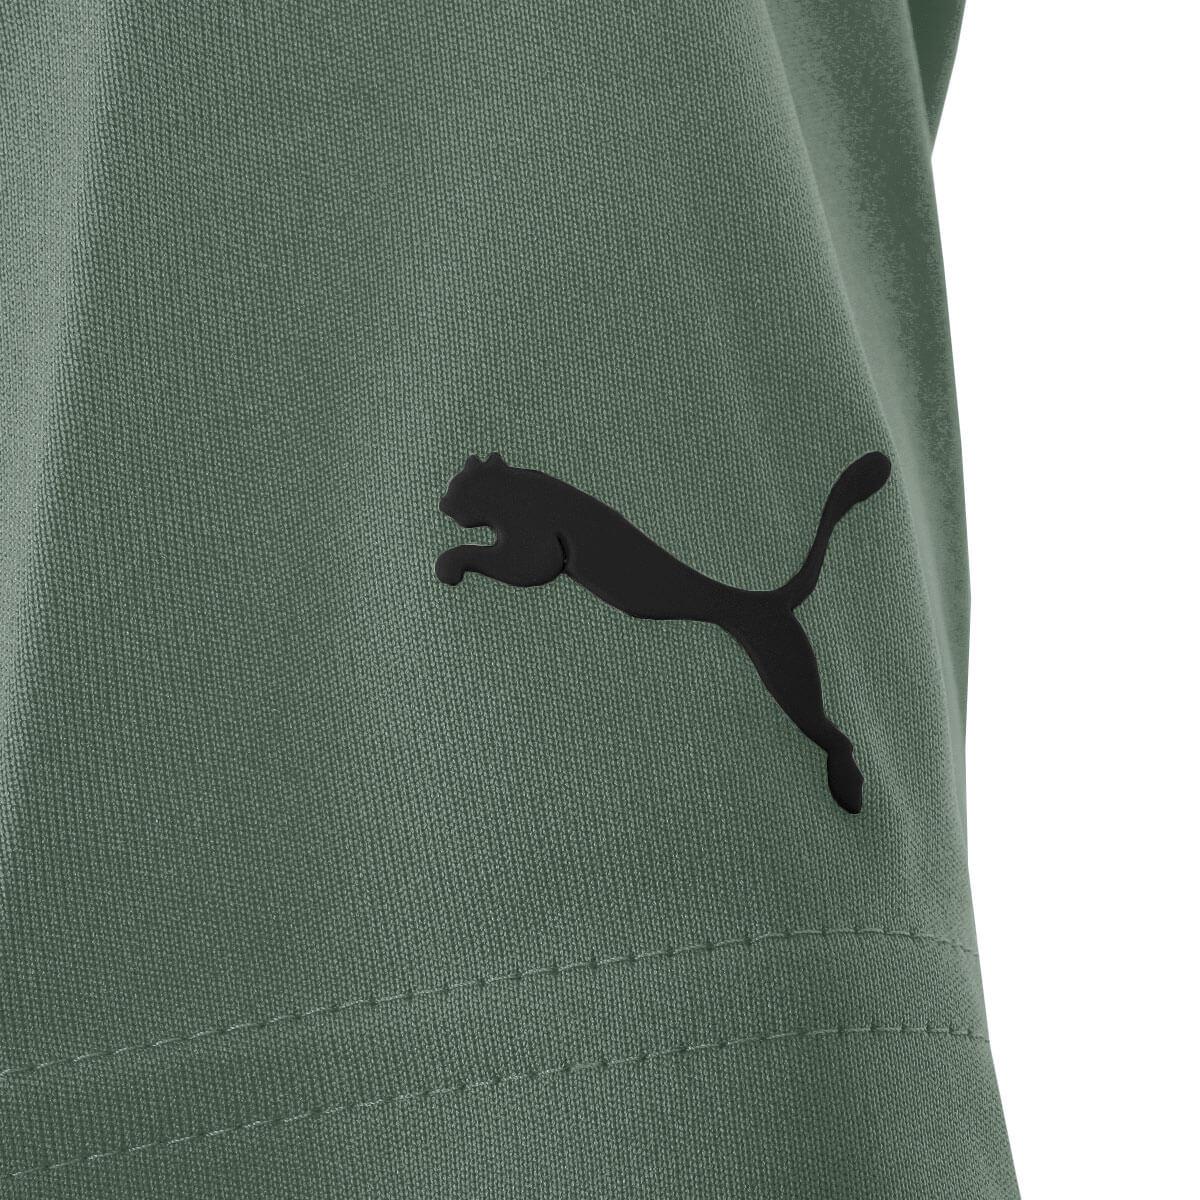 Puma-Golf-Mens-Essential-Pounce-Cresting-DryCell-Tech-Polo-Shirt-46-OFF-RRP thumbnail 21